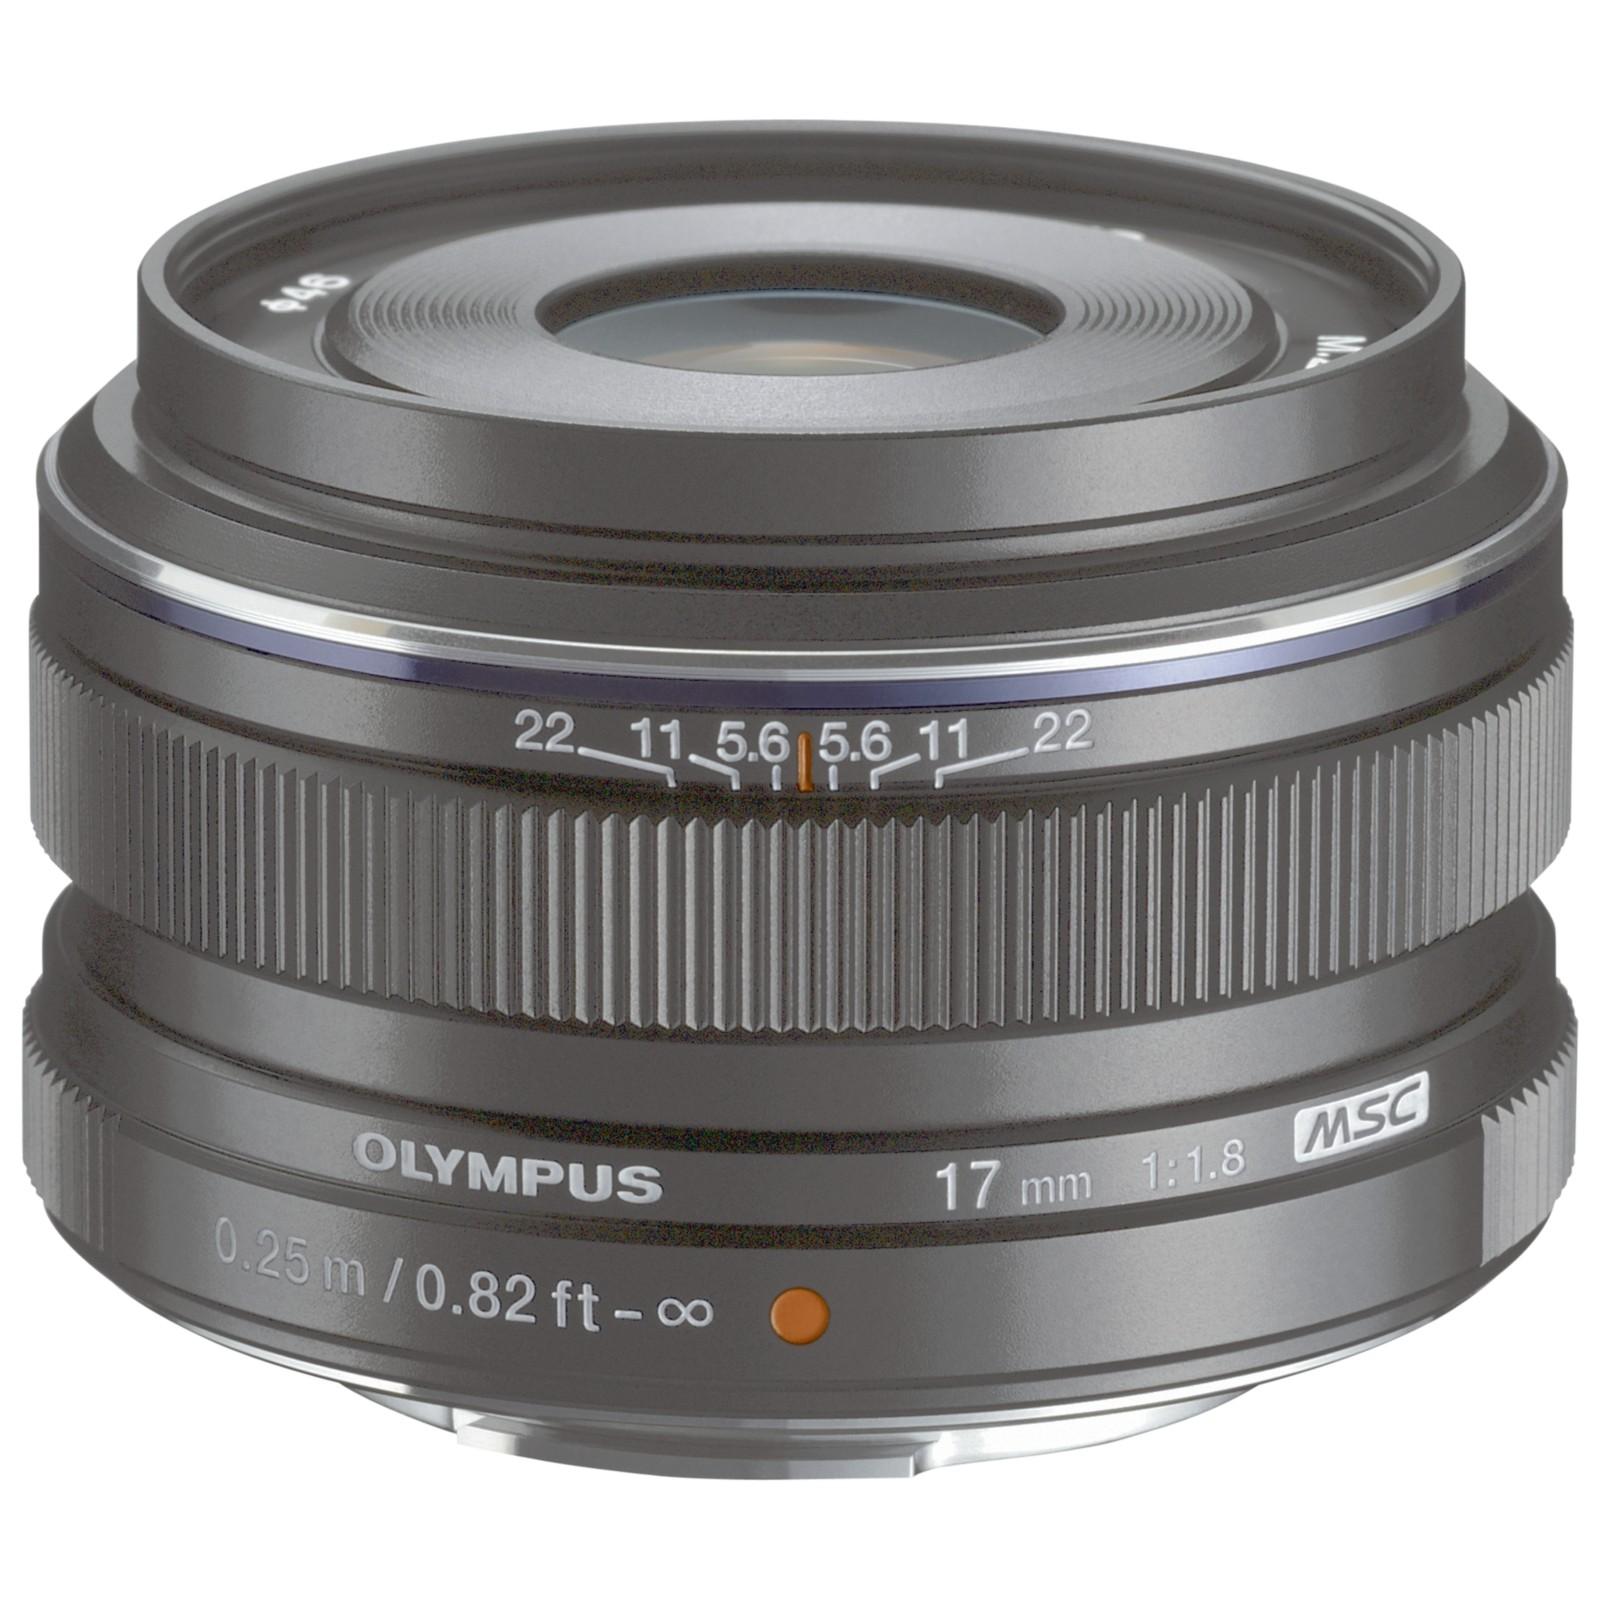 Olympus M.ZUIKO Digital 17mm f1.8 Compact Wide Angle Lens Black